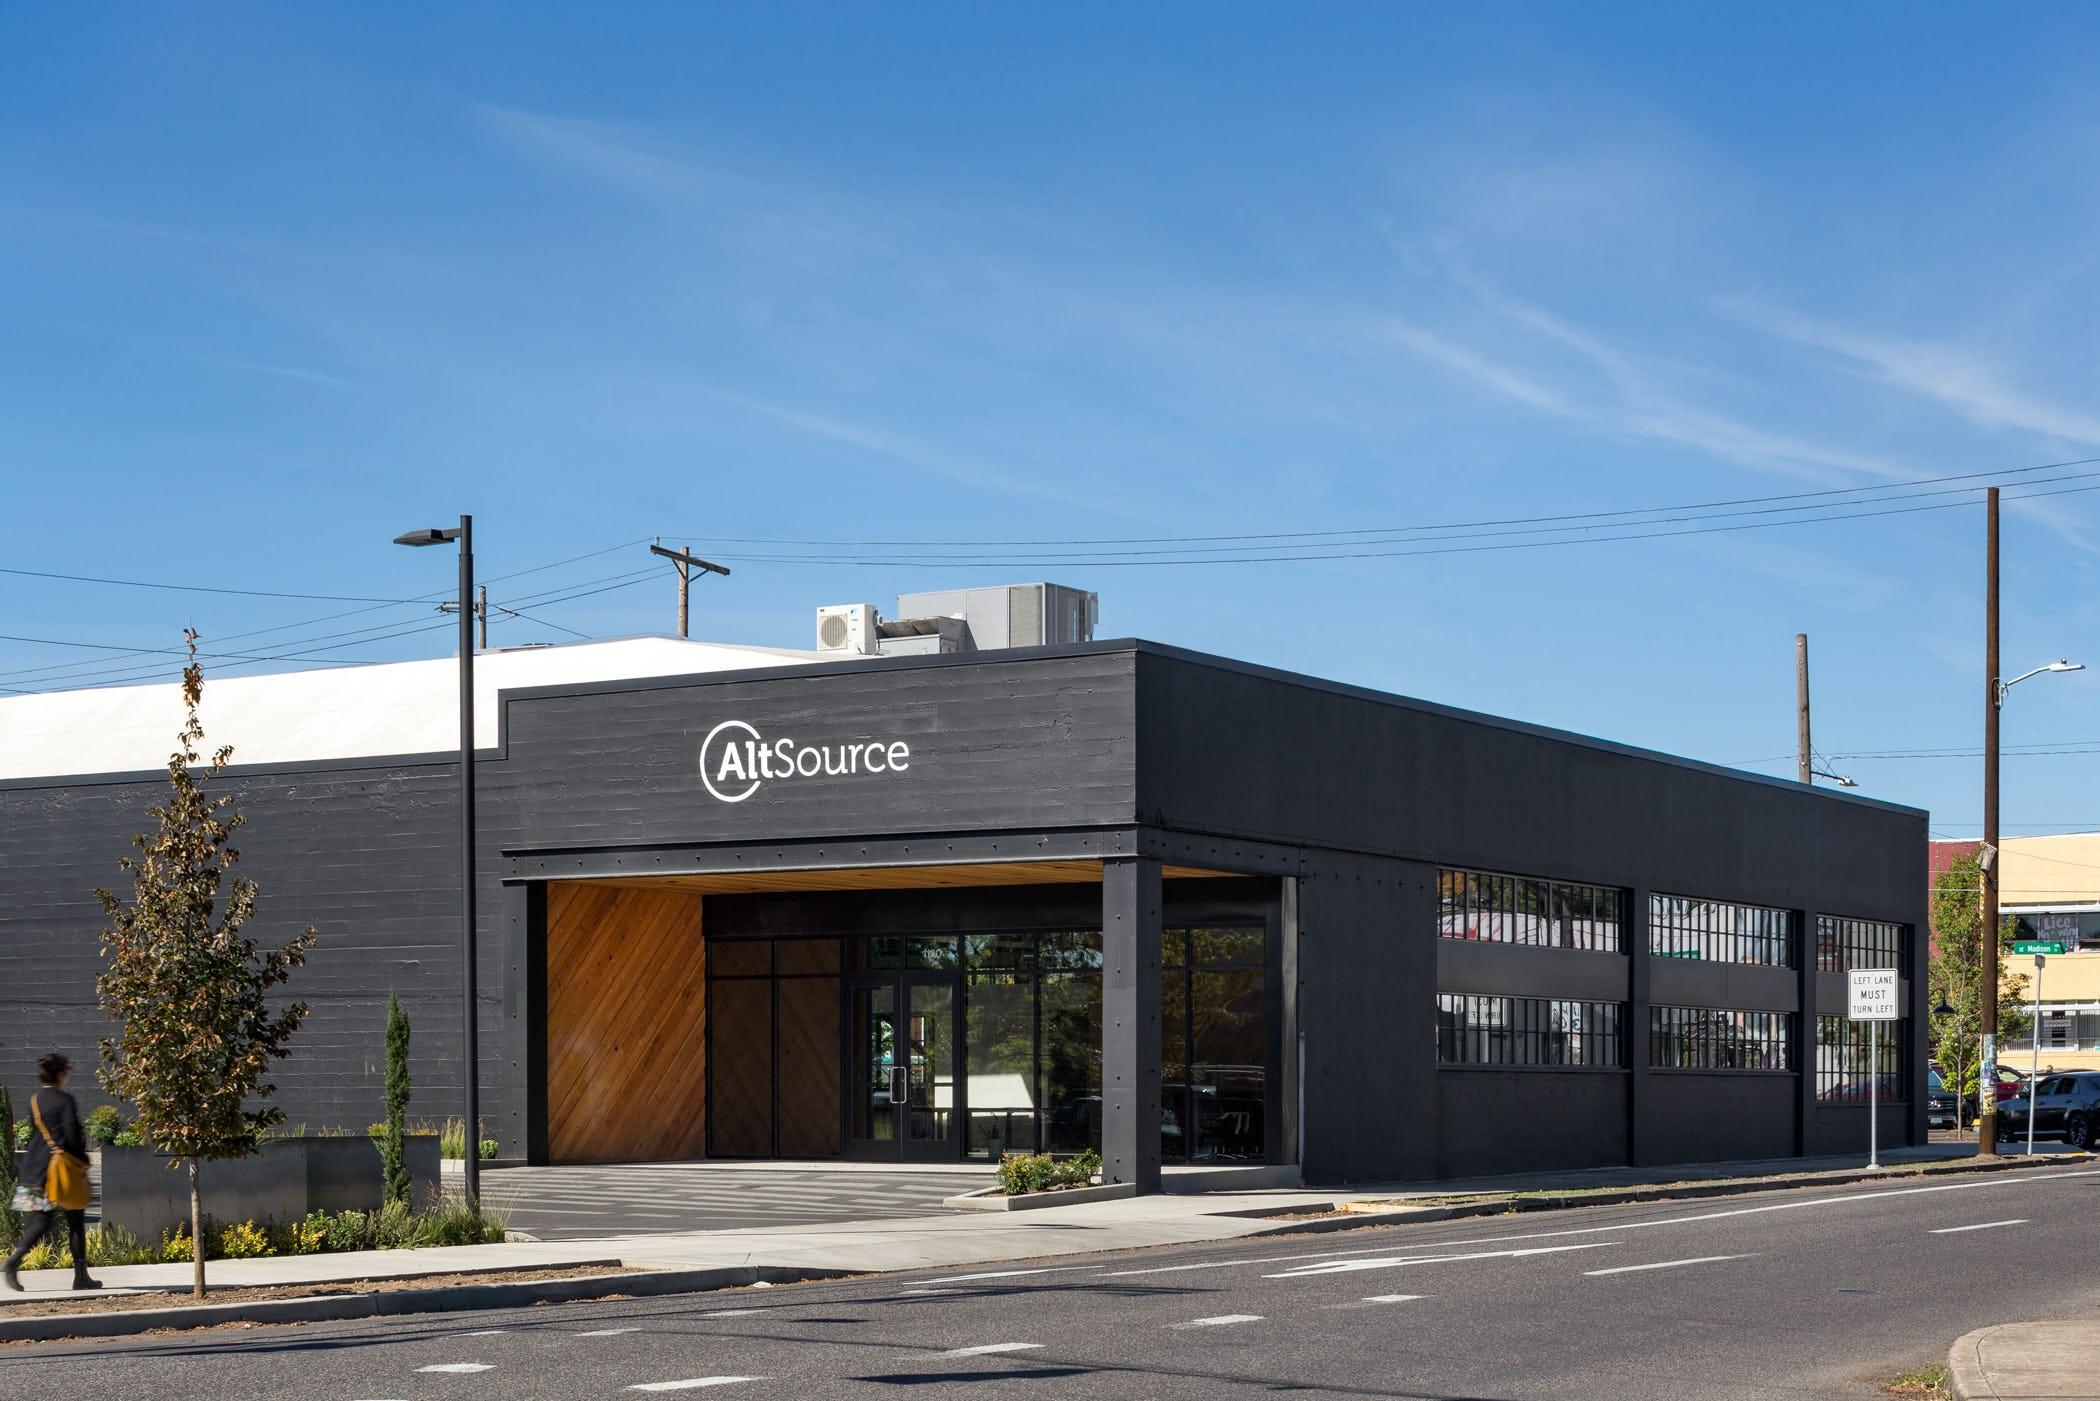 Altsource eastside exterior